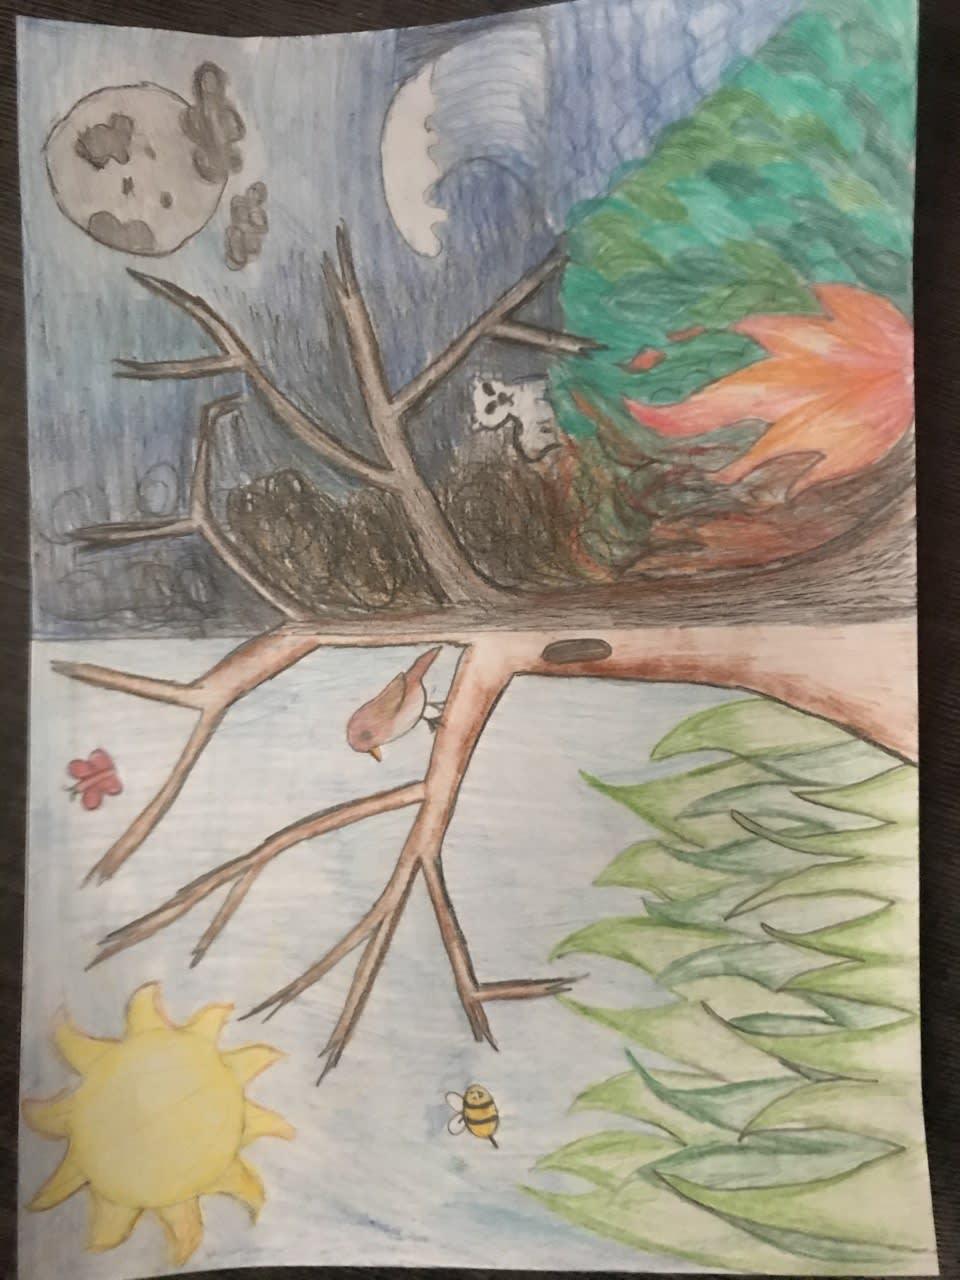 Danika krishnasothy, age 11 Inspired by global warming